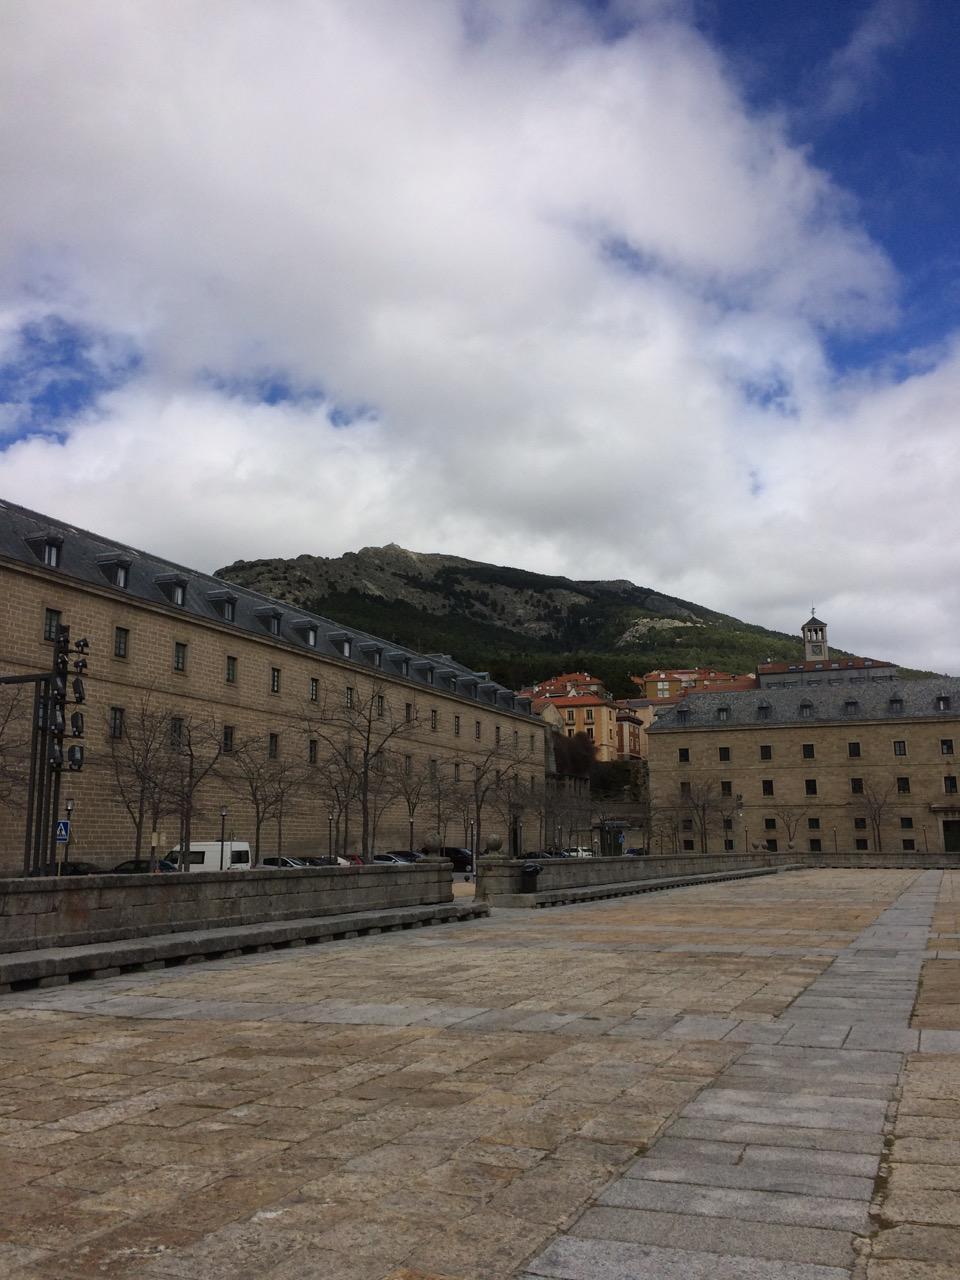 El Escorial is situated in the Sierra de Guadarrama